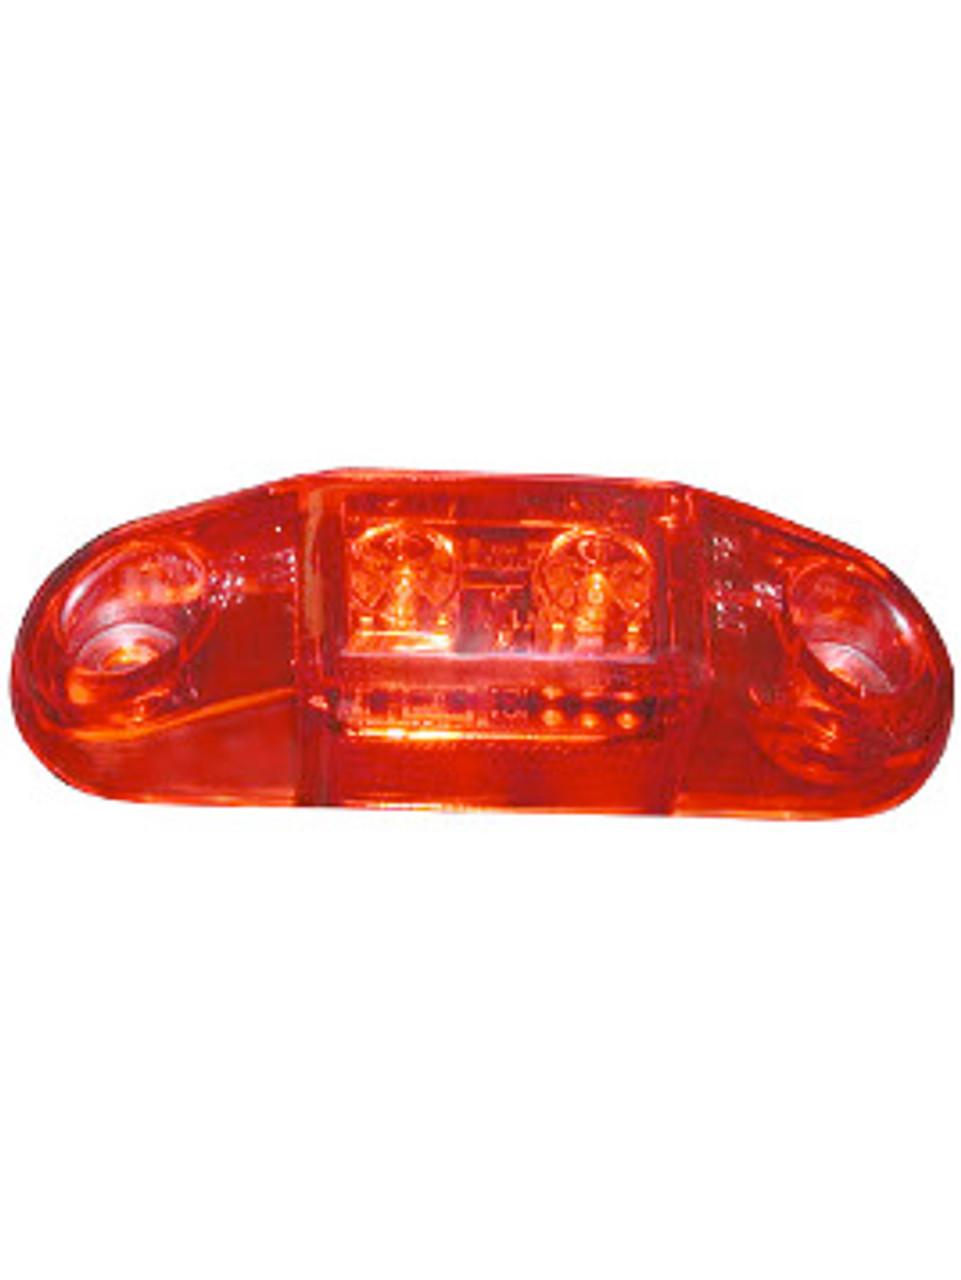 LED168R2 --- Peterson Piranha® Slim-Line Mini LED Clearance/Side Marker